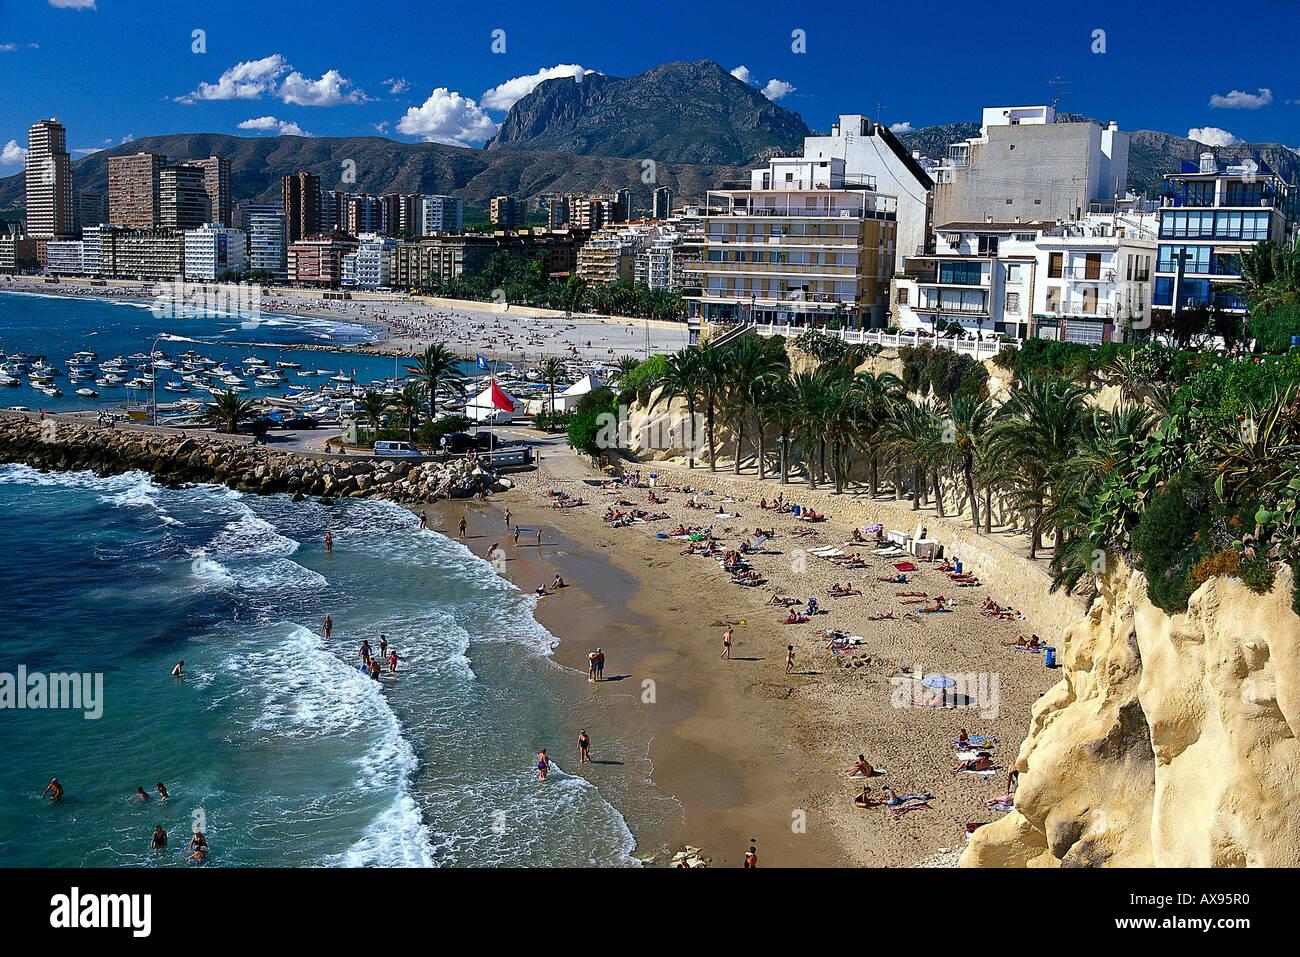 Playa Mal Pas, Benidorm, Provinz Alicante, Communauté Valencienne, Espagne Photo Stock